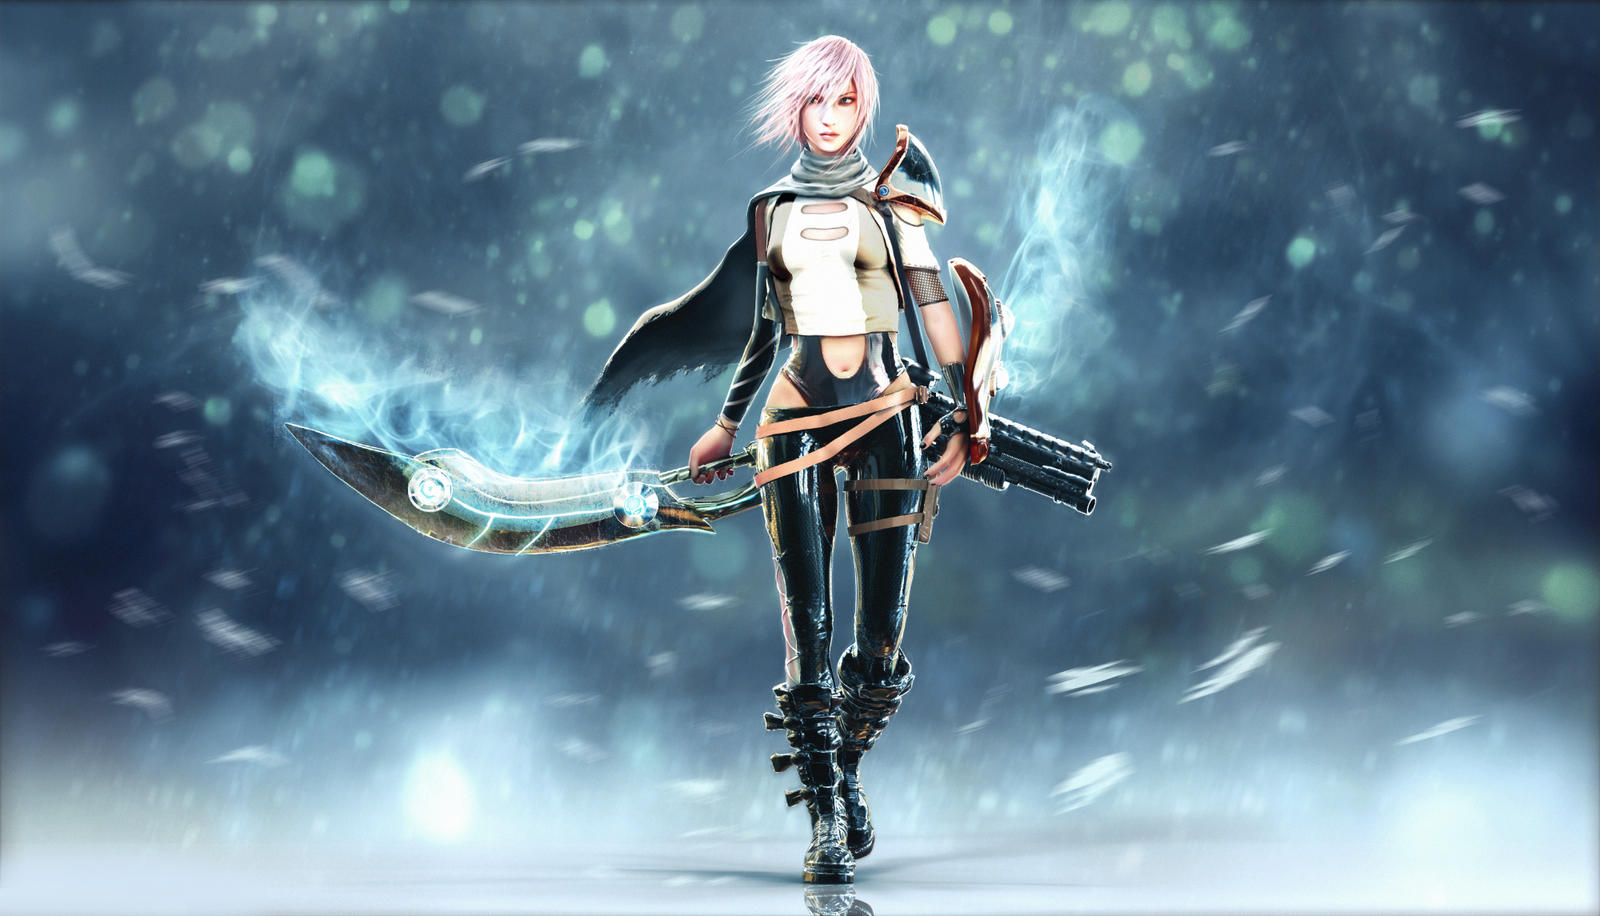 Lightning Returns v2 Contest by s0r3nGZV